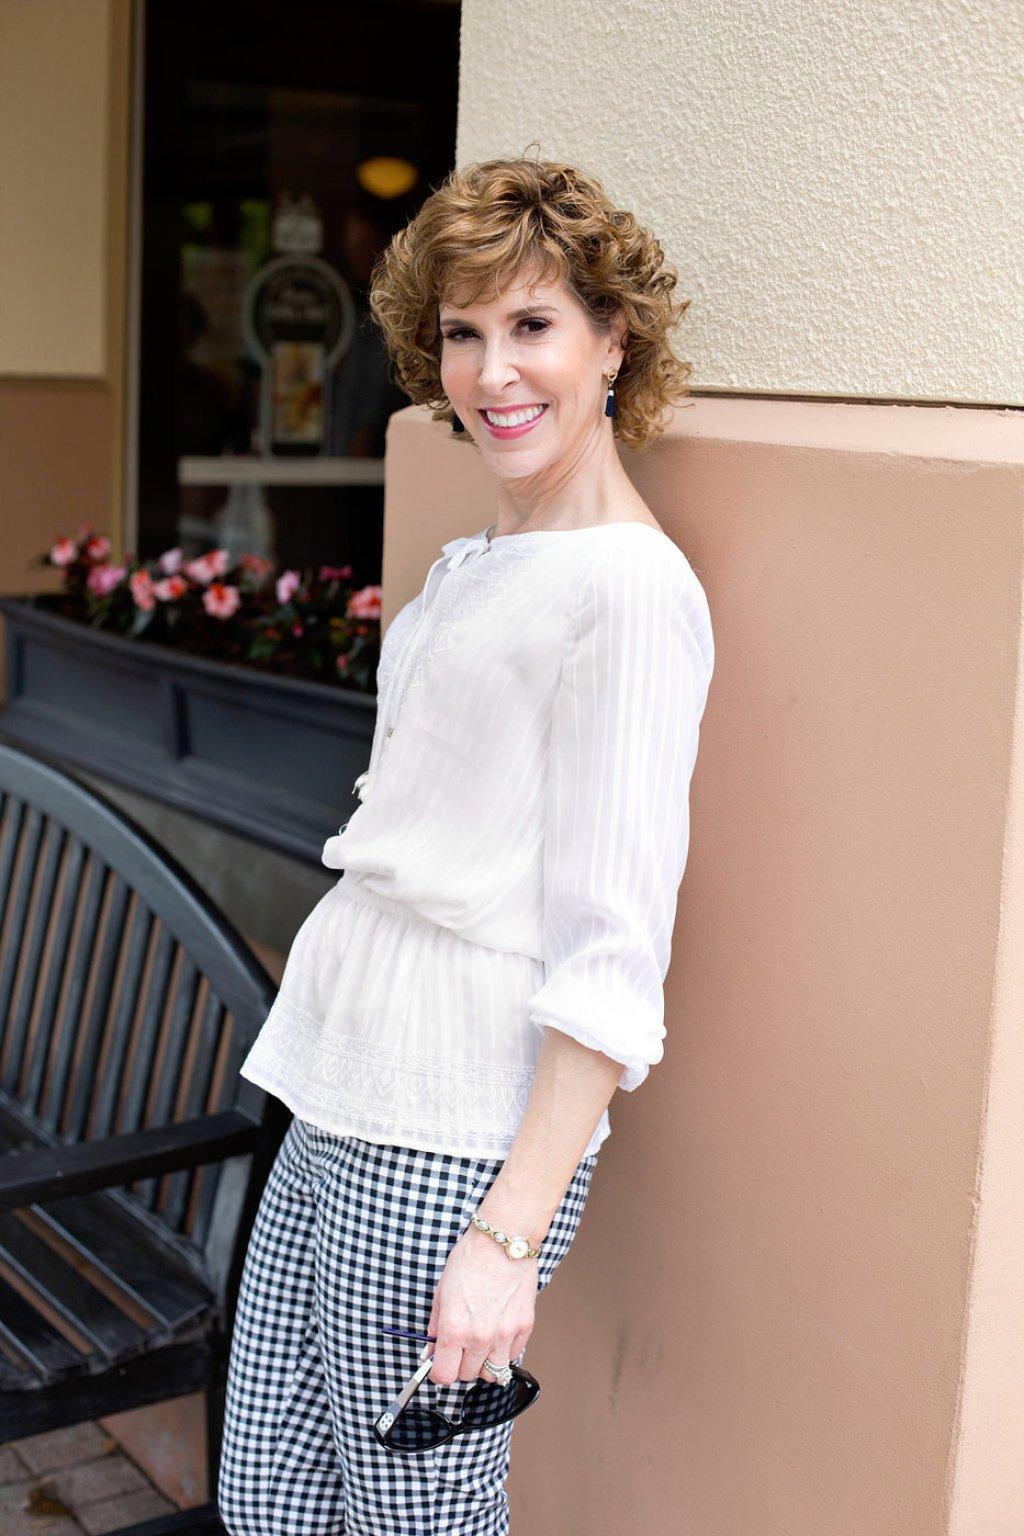 white top - white peplum top - white peasant blouse - white peasant top - feminine white blouse